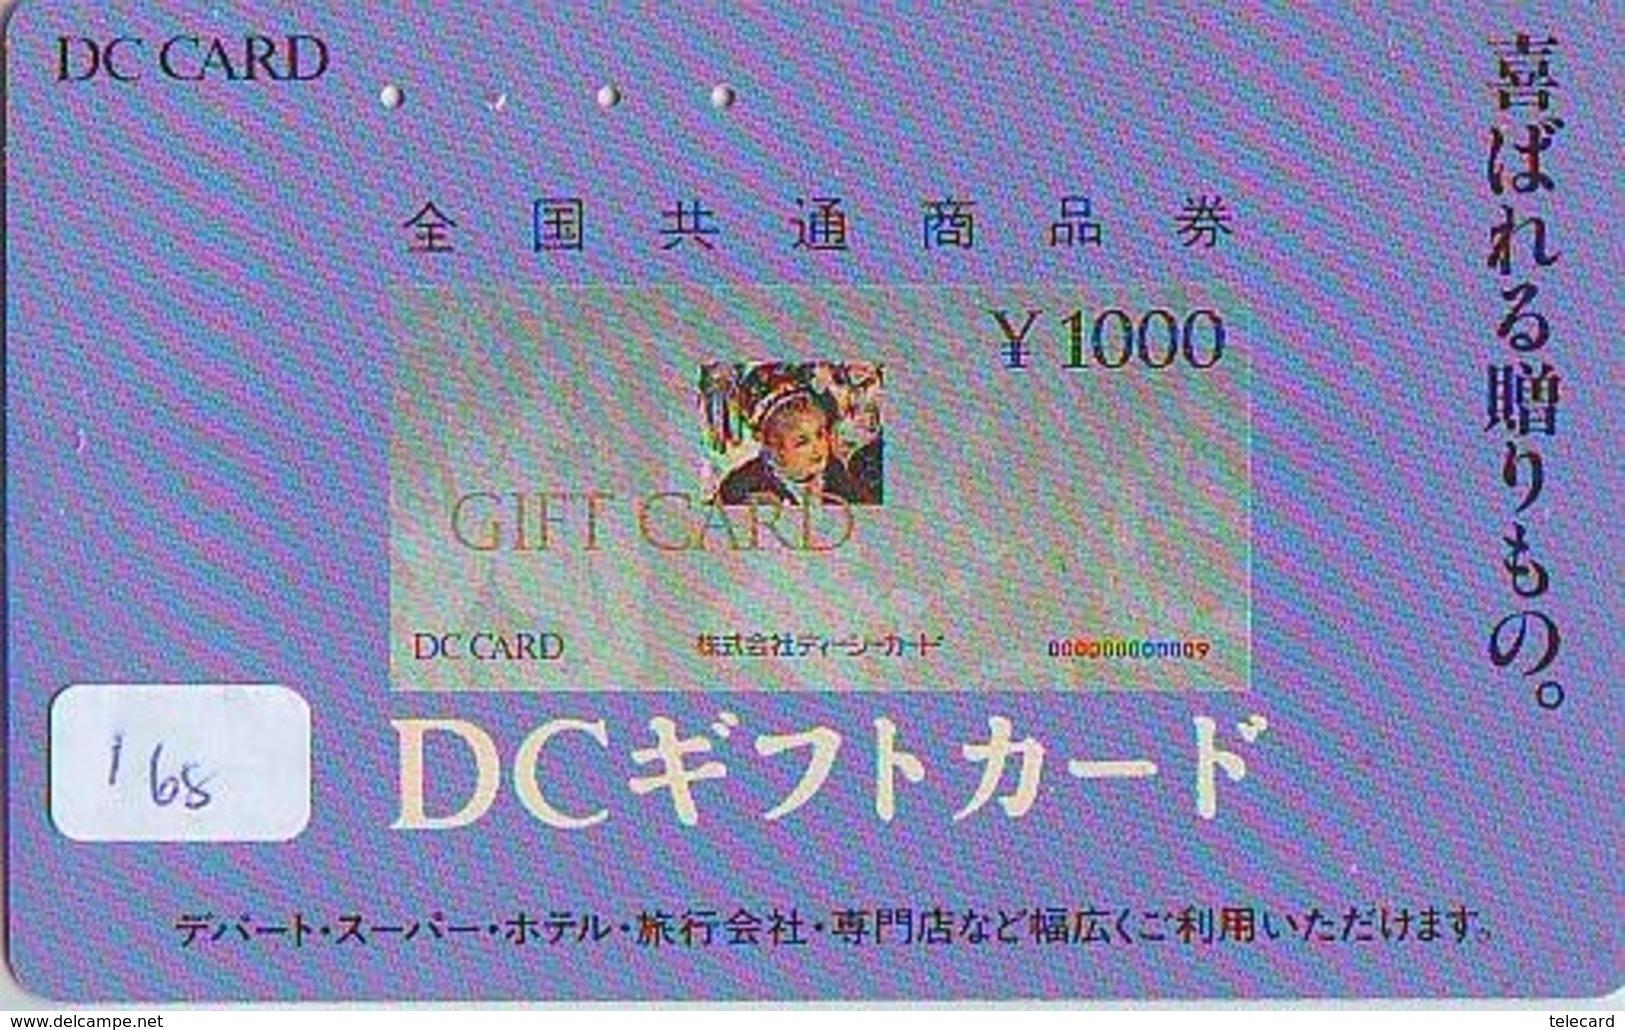 Télécarte Japon * BILLET De Banque  (168) Banknote  * Japan Phonecard * GELDSCHEIN * Coin * BANKBILJET - Timbres & Monnaies